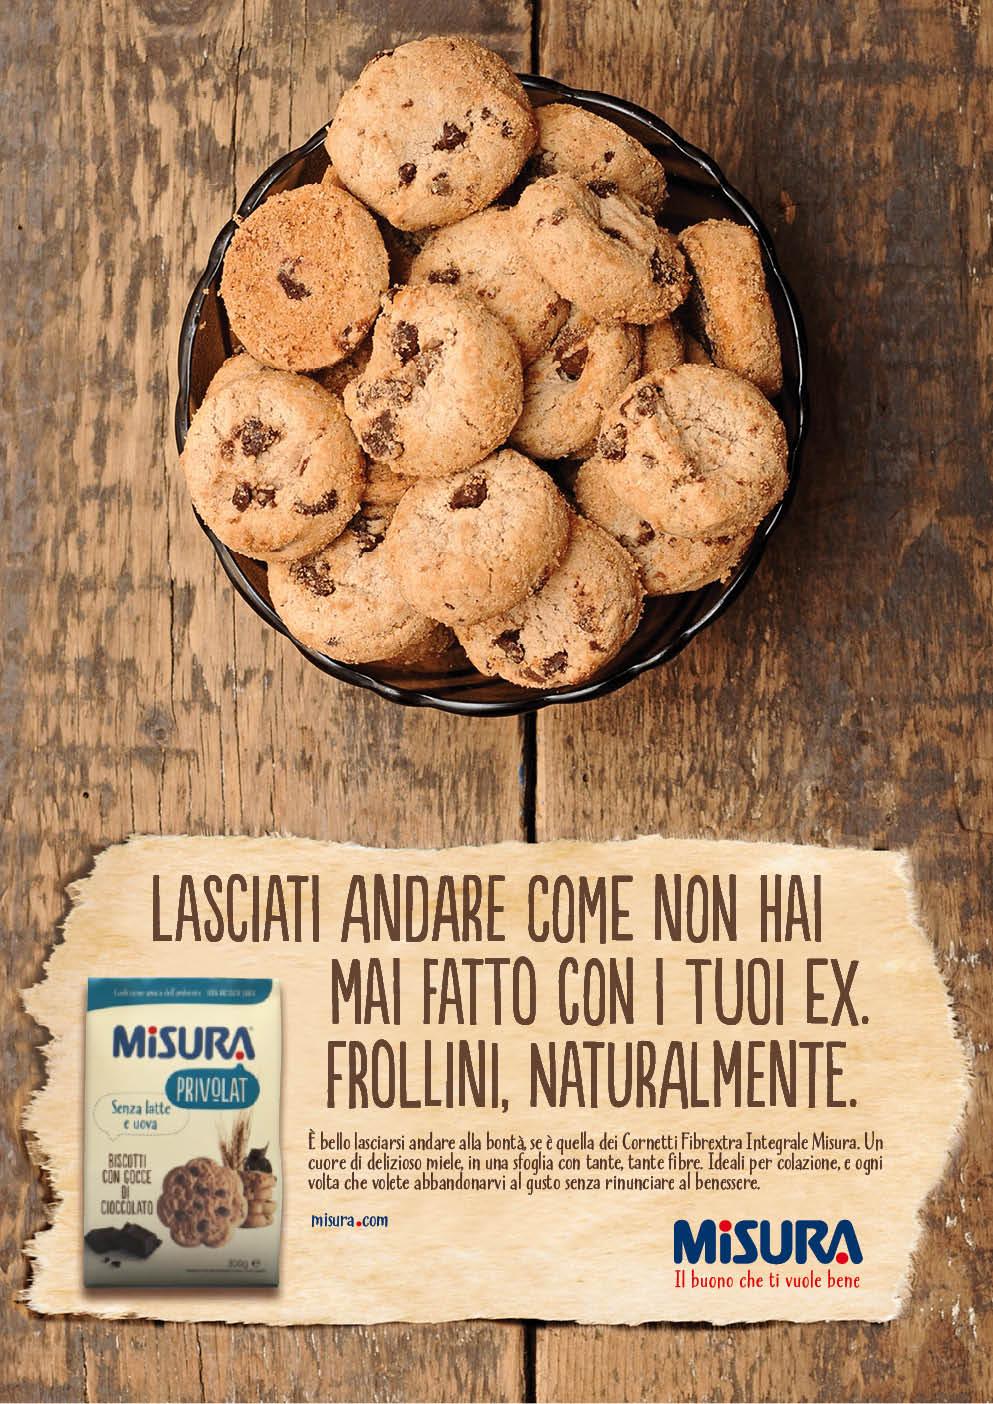 Misura biscotti